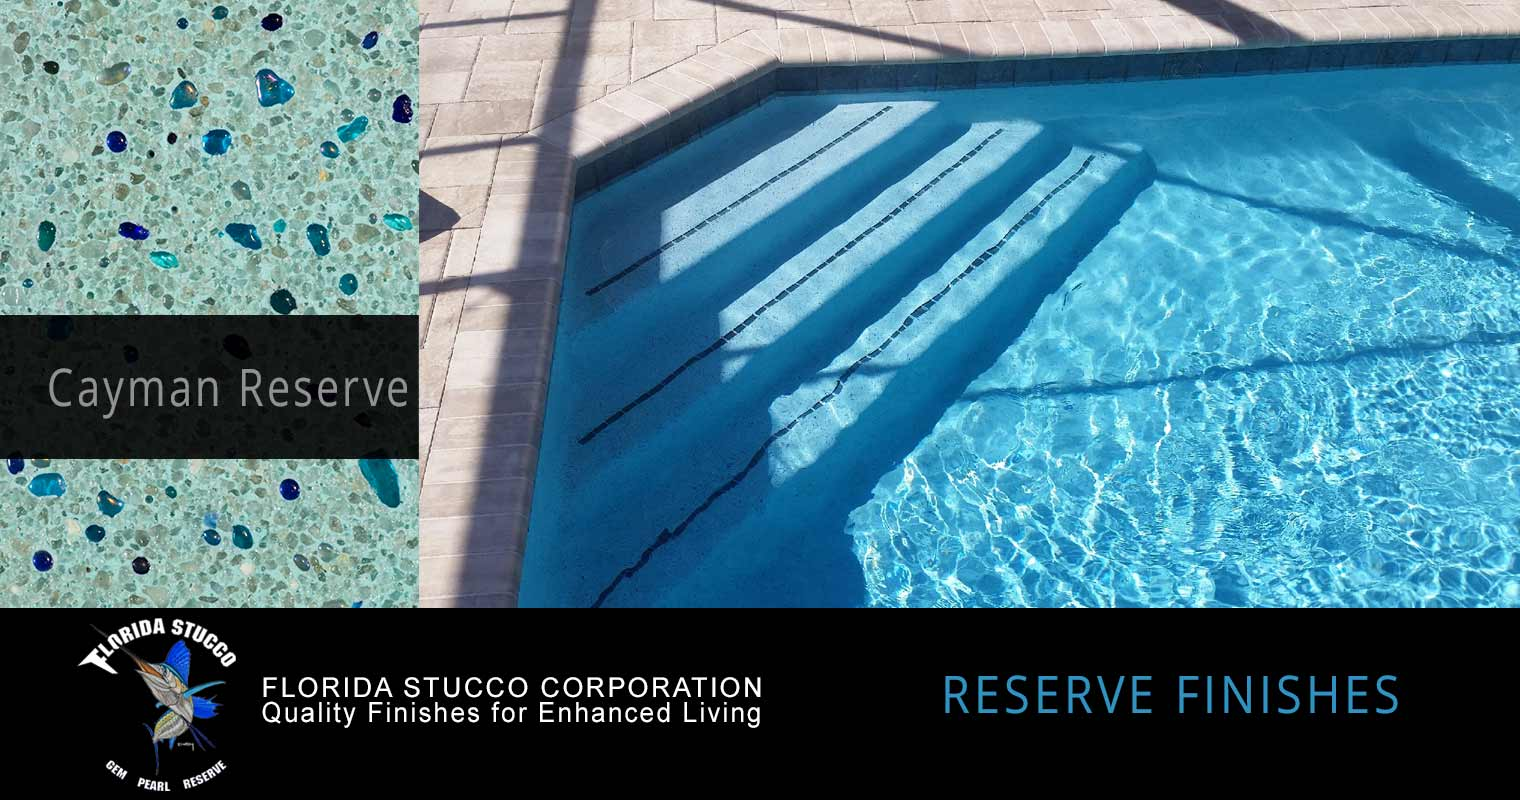 Florida Stucco - Cayman Reserve Gem and Glass Plastering Pool Sample Finish